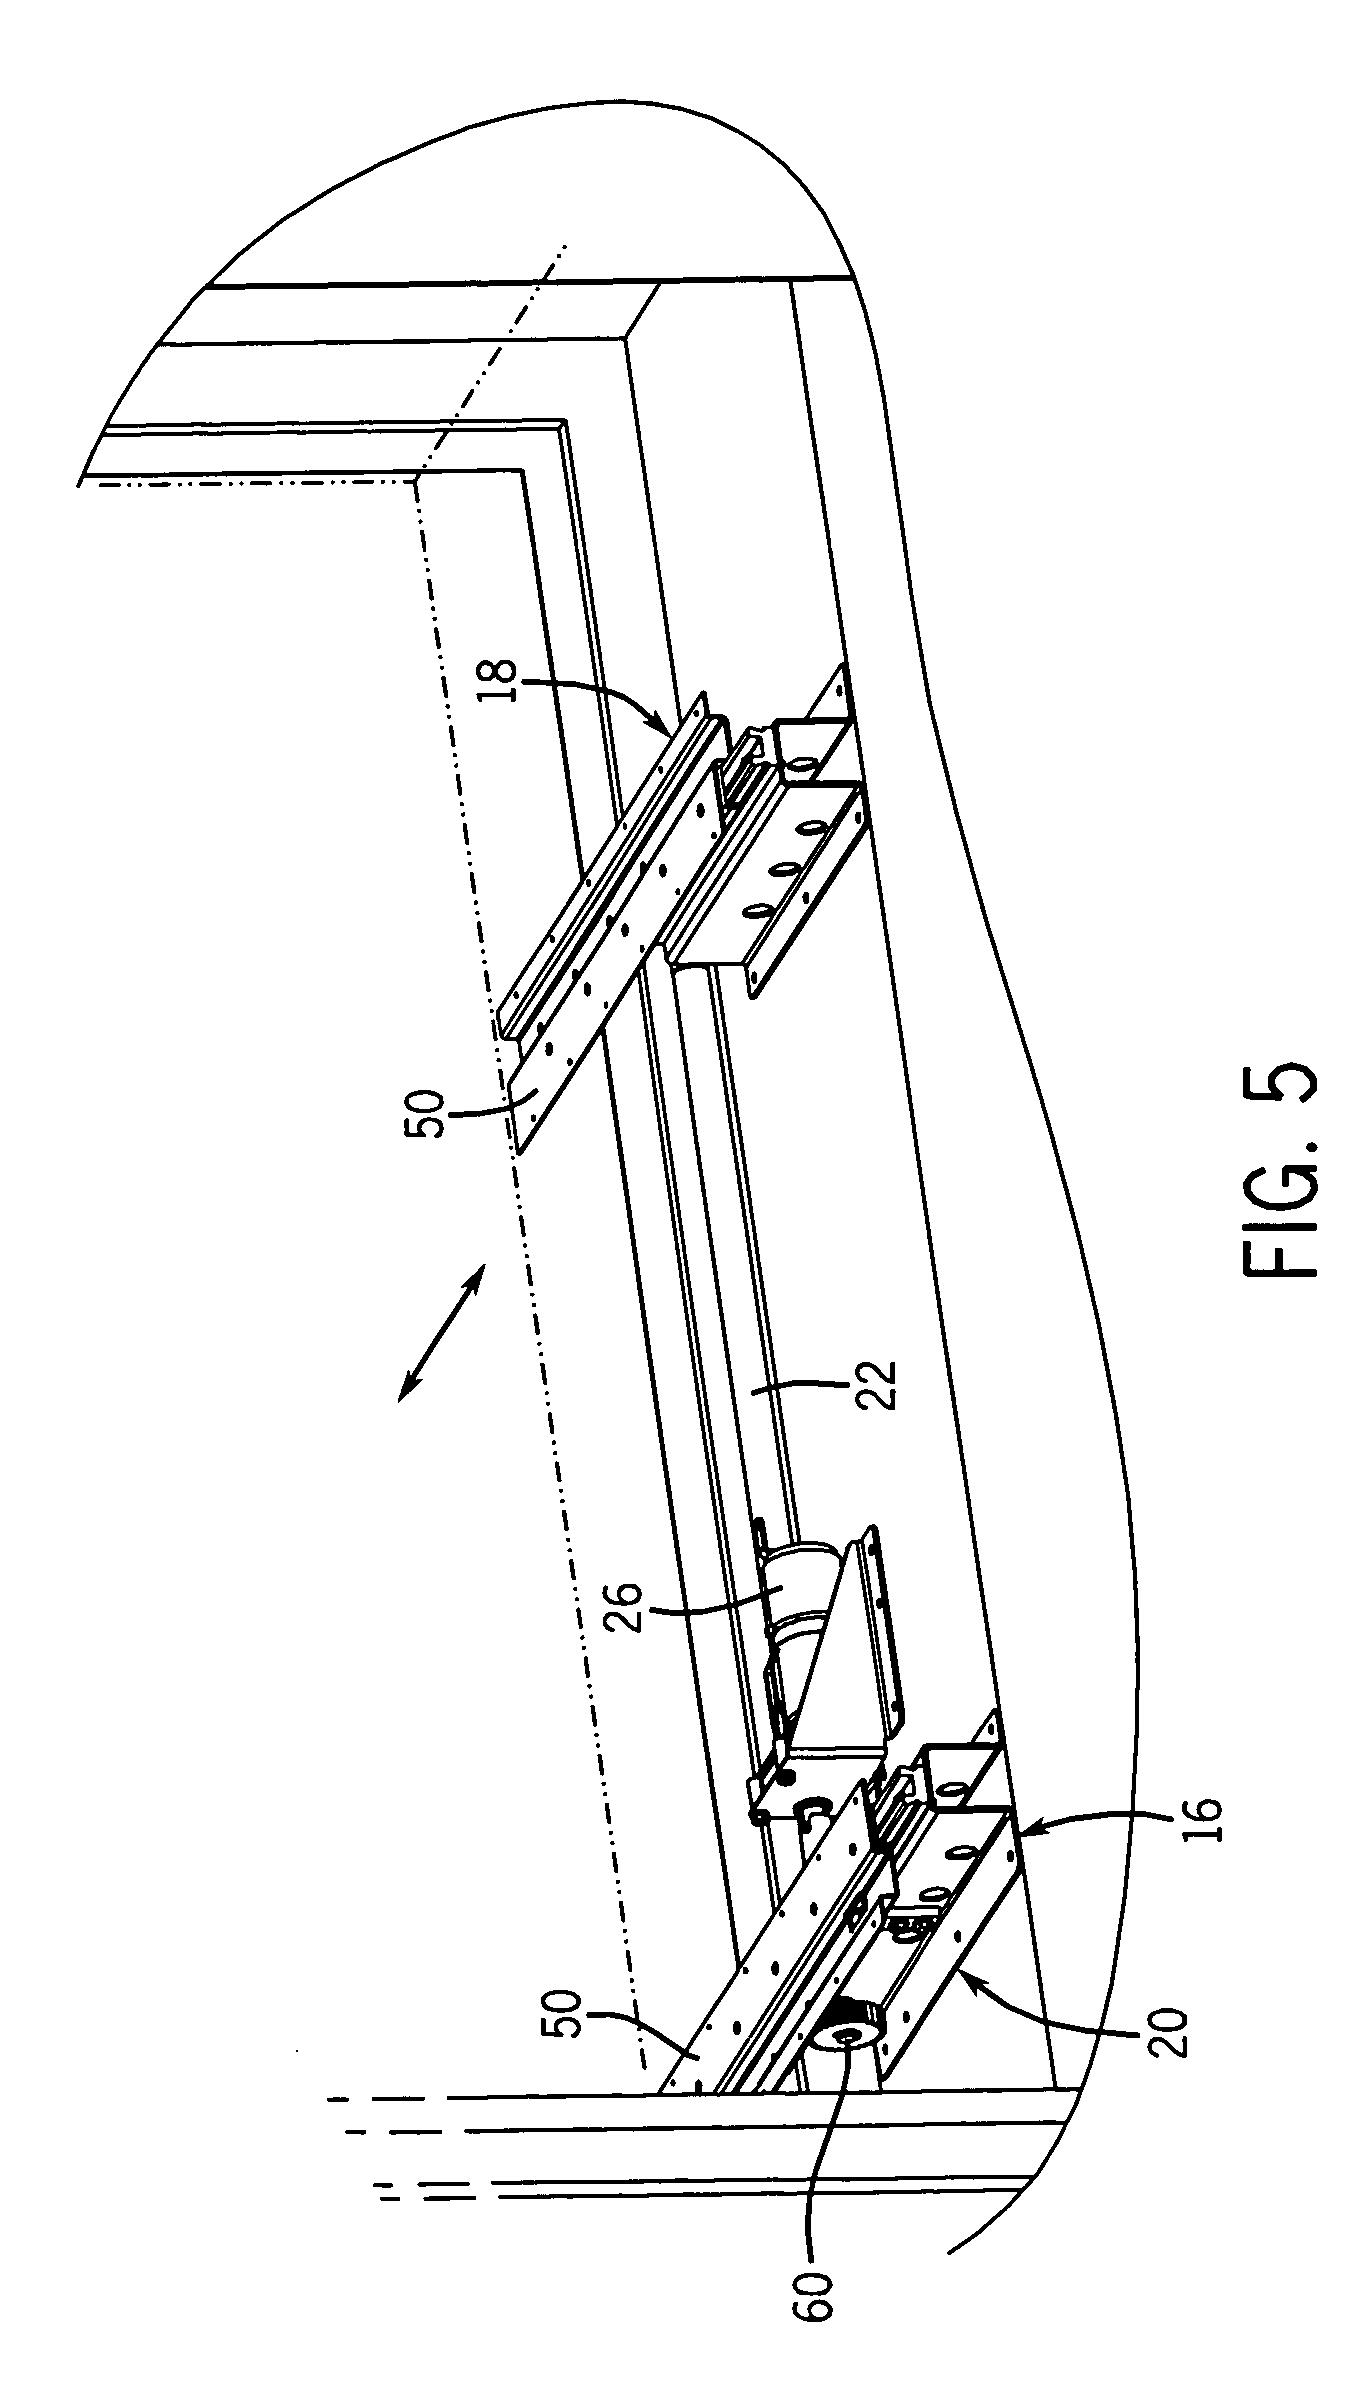 2007 335i fuse box diagram